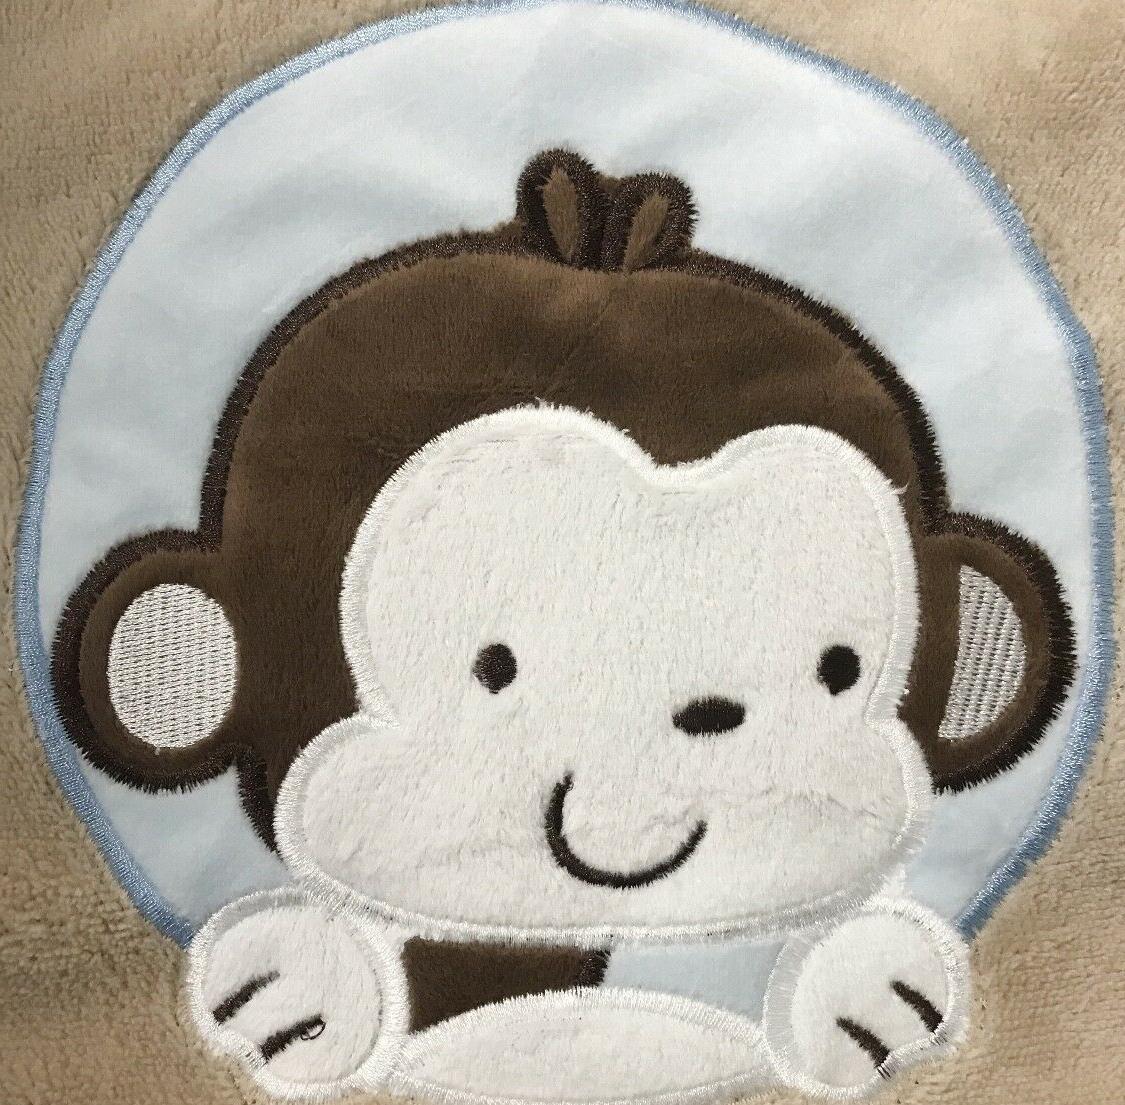 NEW Blanket, Baby Boy Or Blanket Or Green